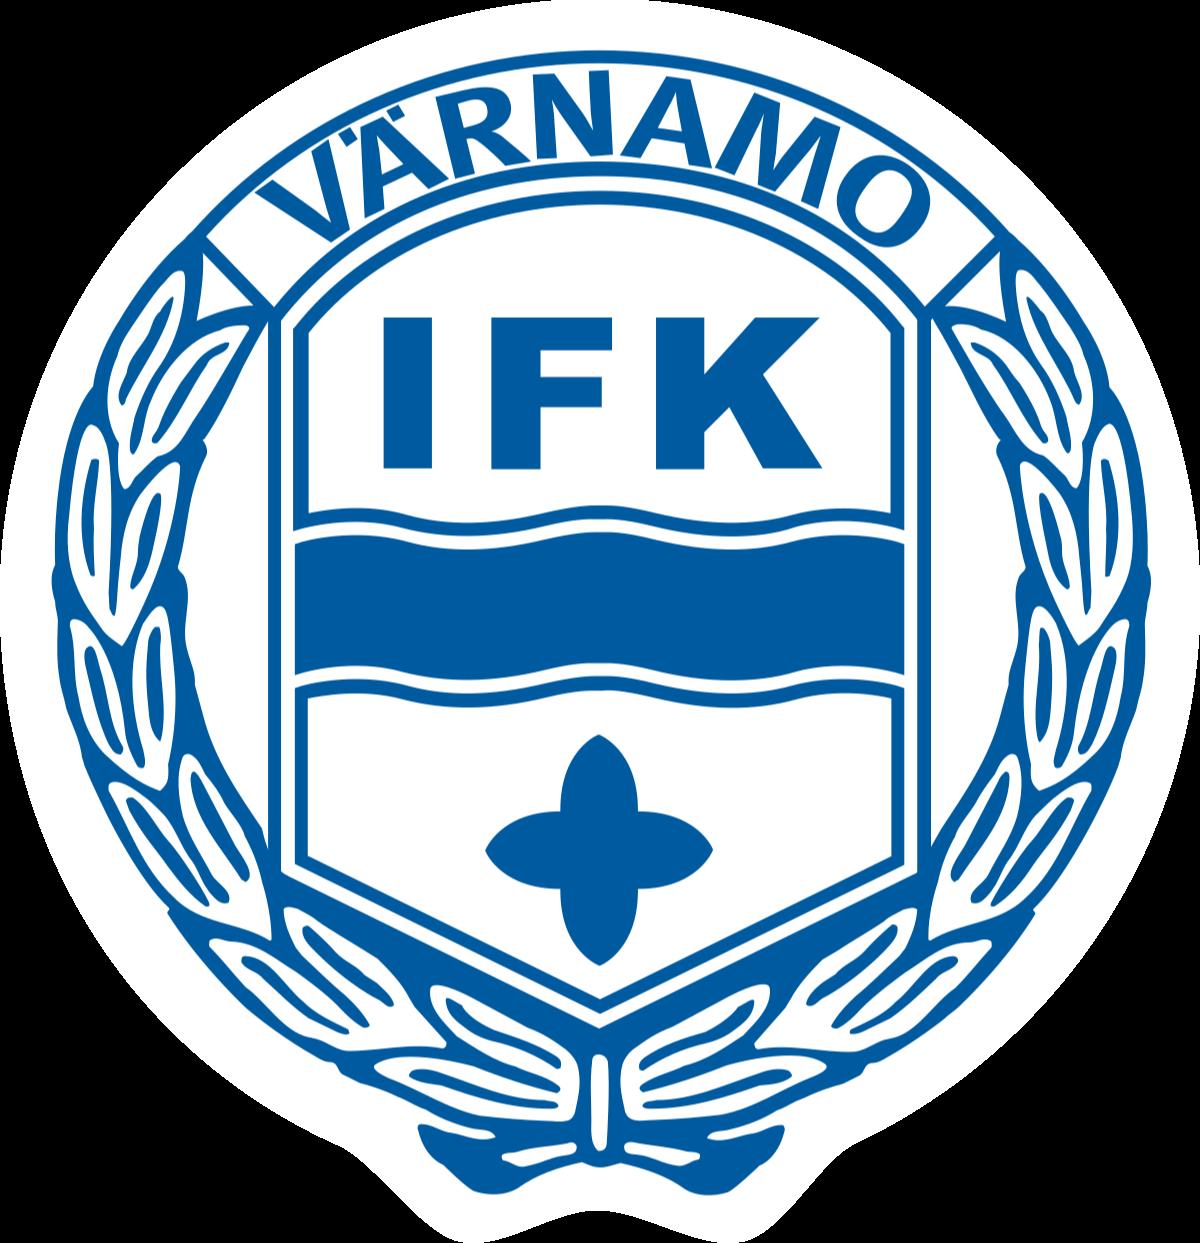 IFK瓦纳默